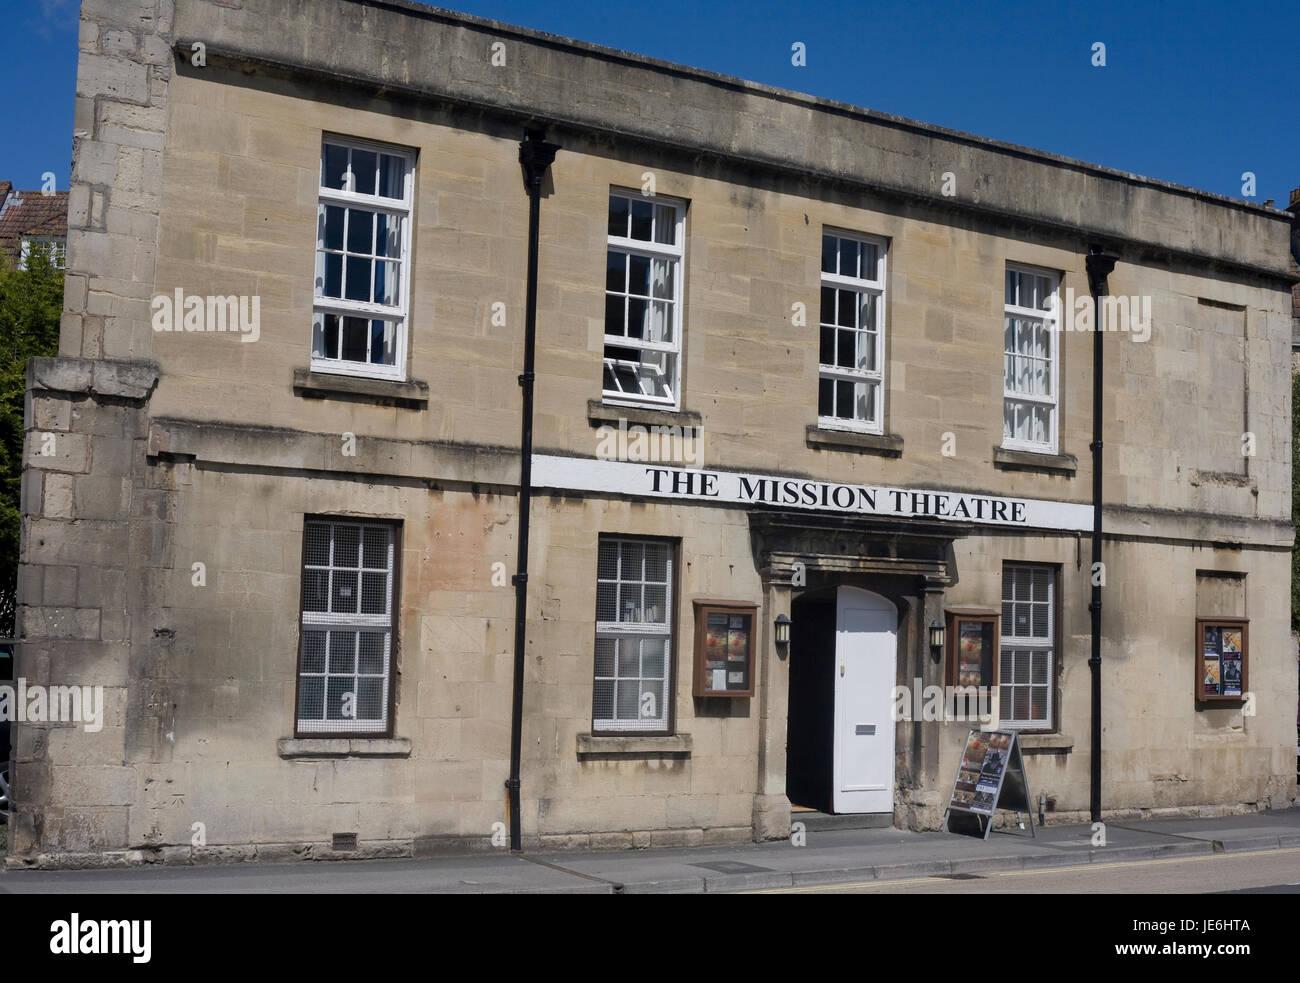 The Mission Theatre in Bath - Stock Image